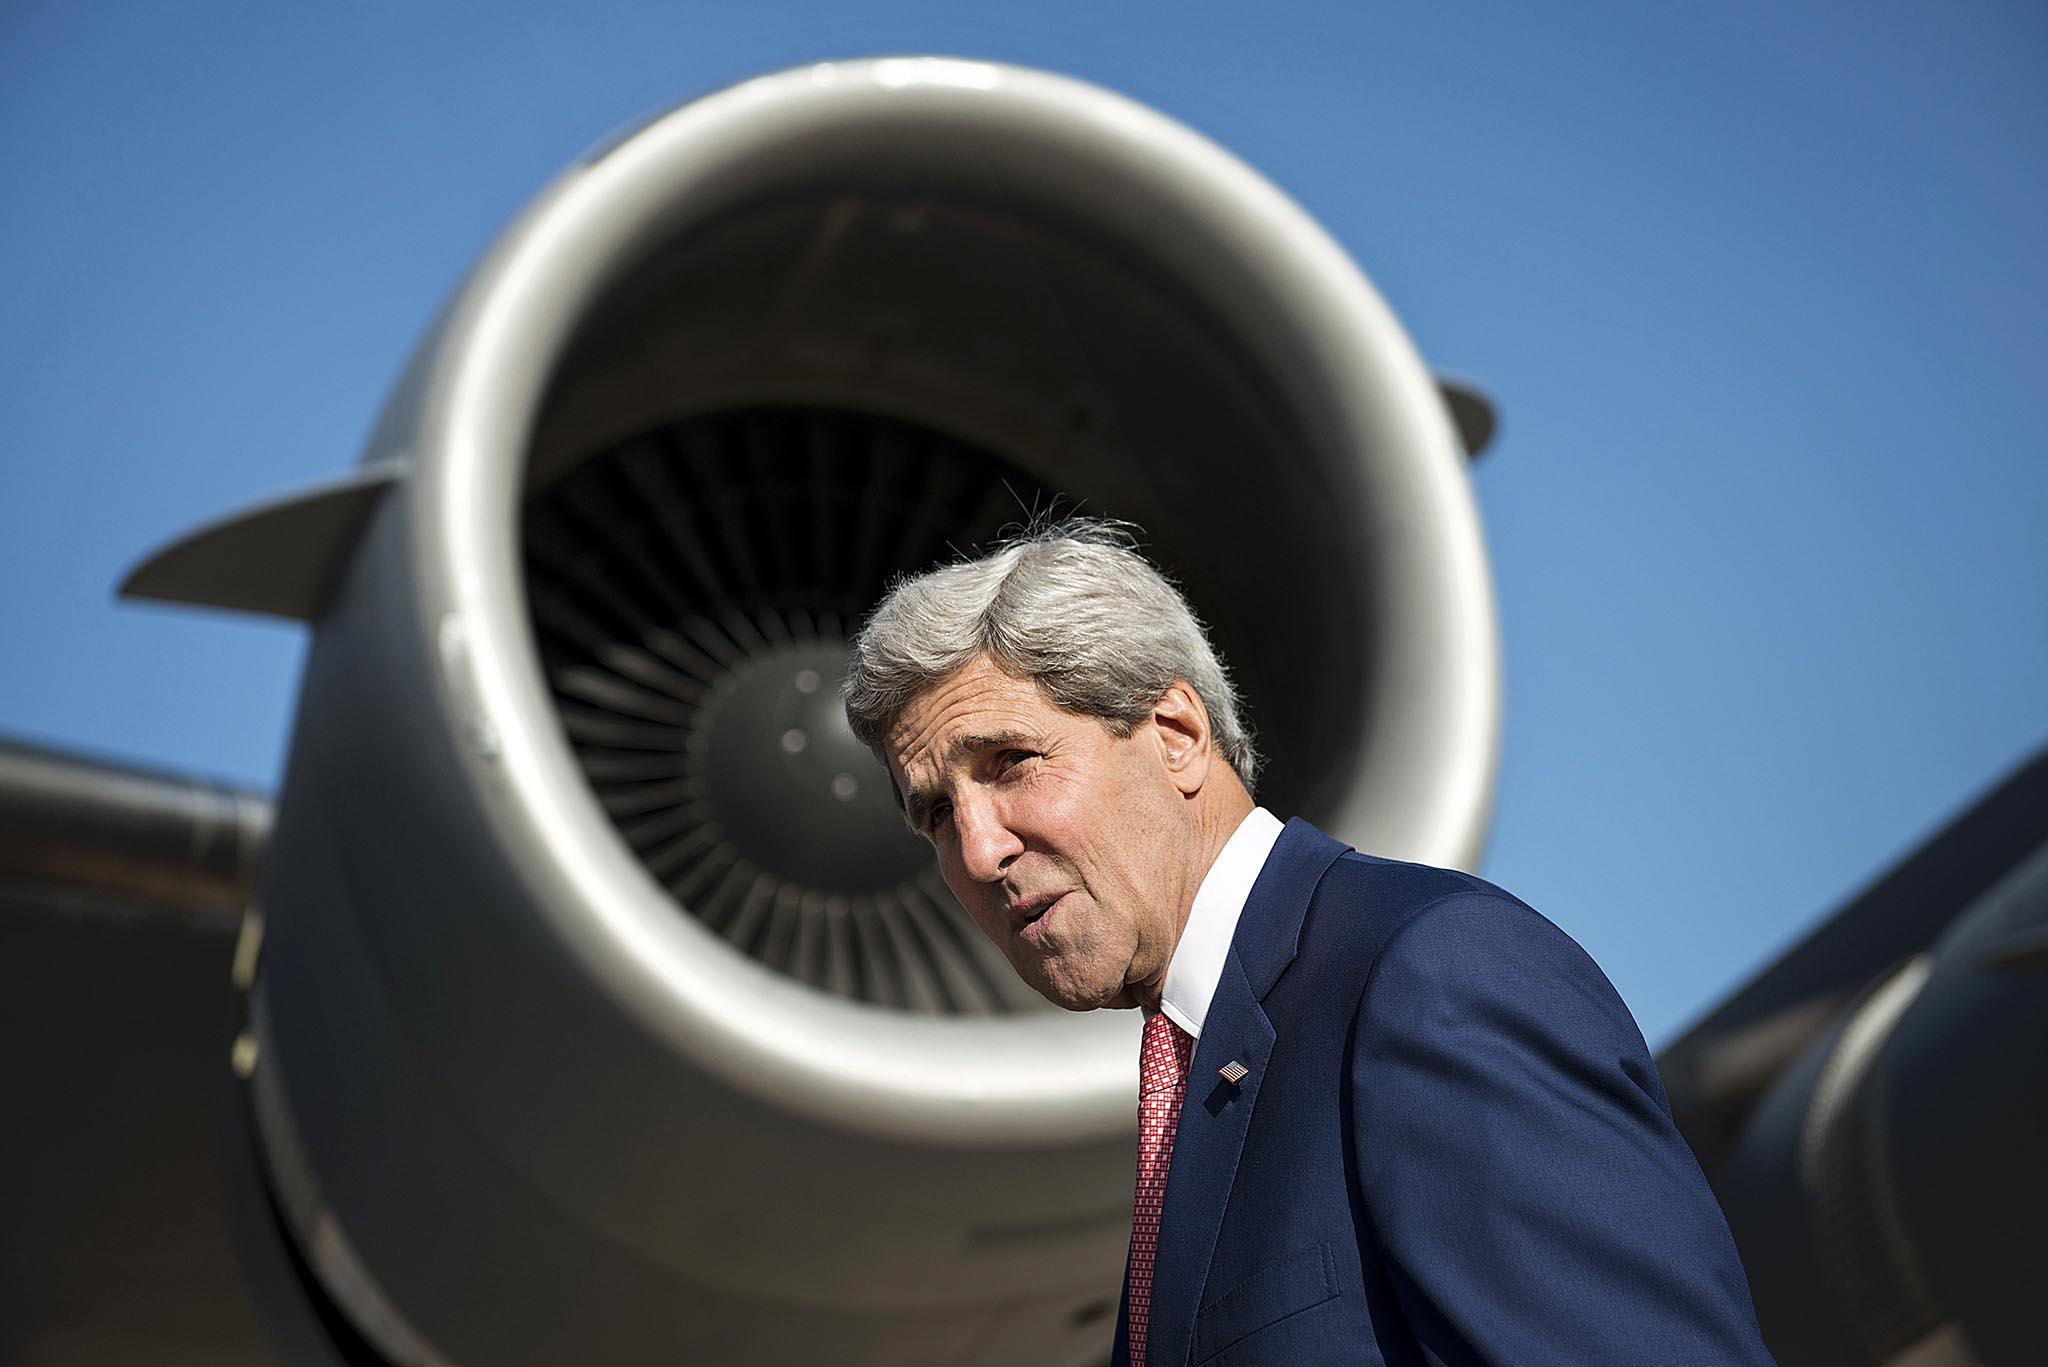 US Secretary of State John Kerry boards